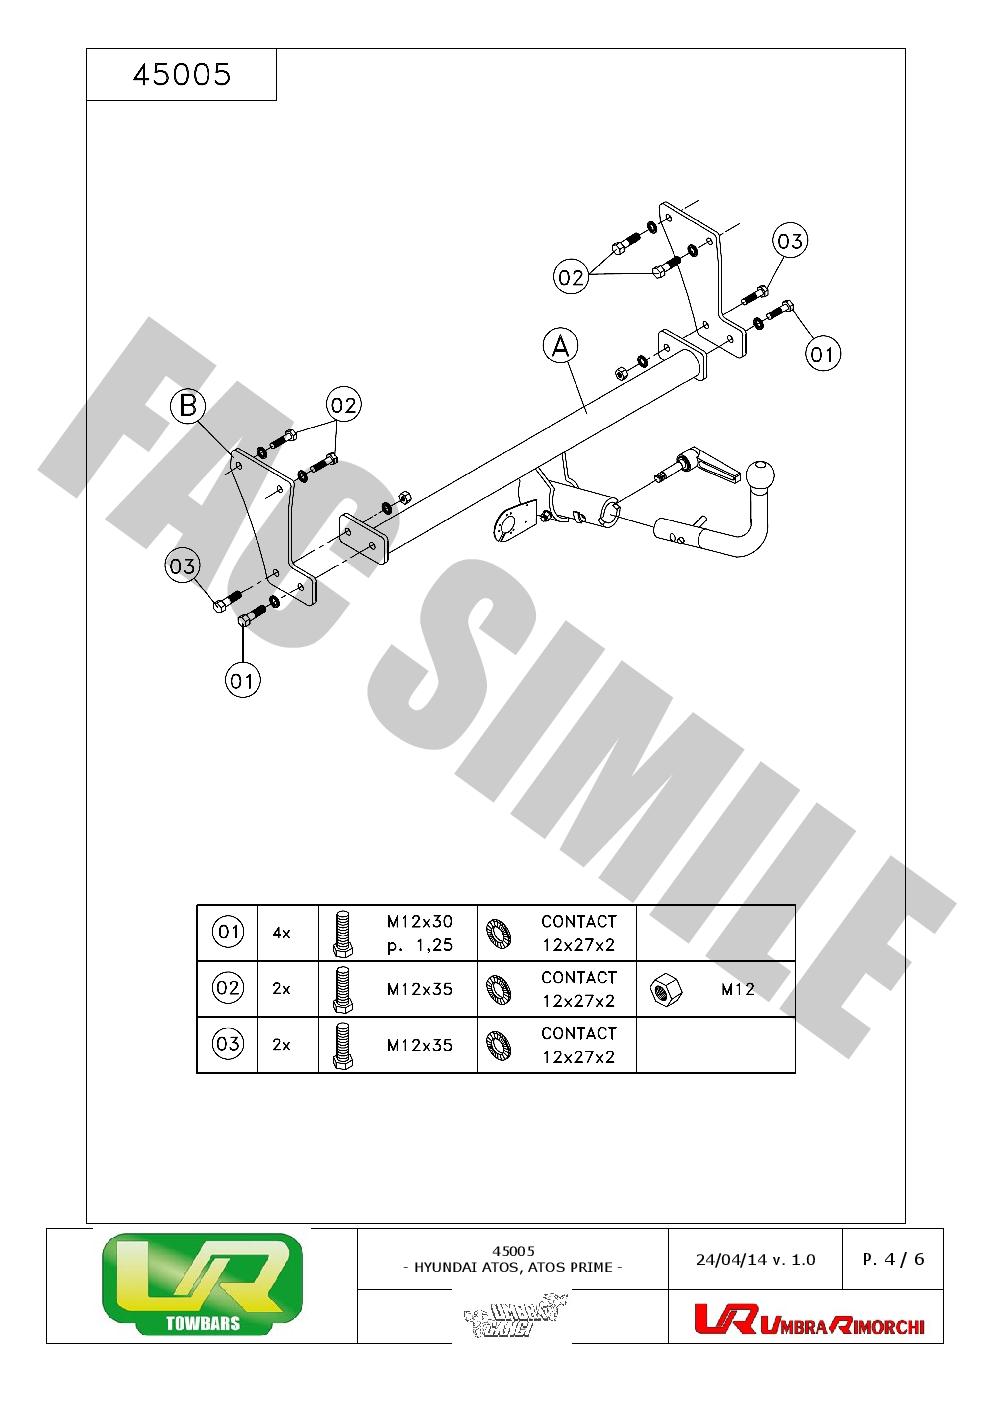 medium resolution of detachable towbar 13pin c2 wiring kit for hyundai